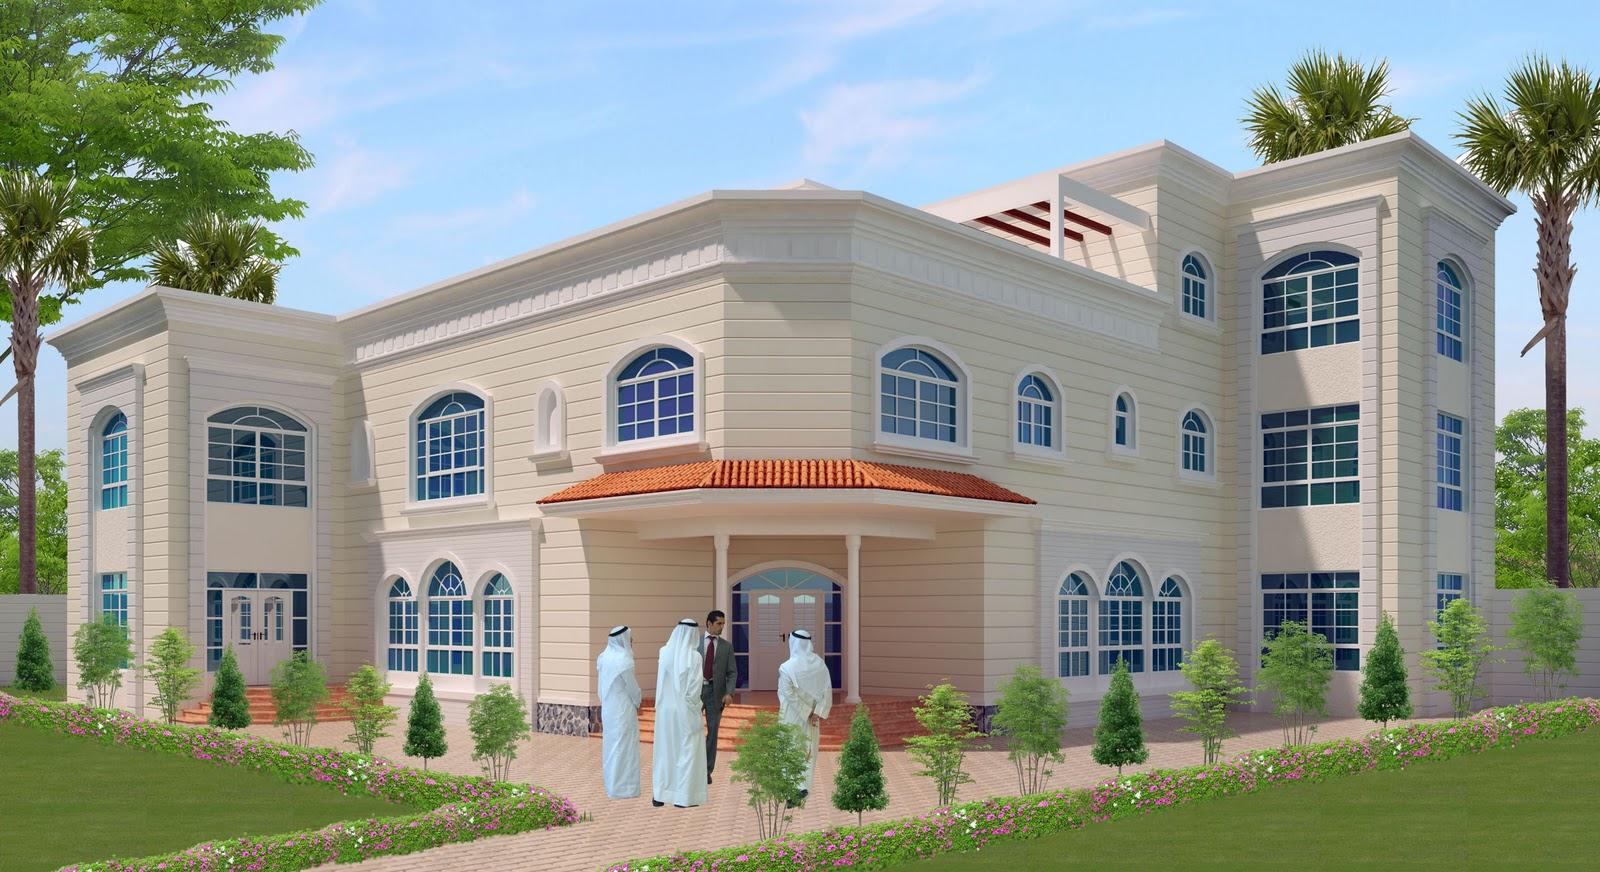 Great House Design Saudi Arabia 1600 x 872 · 368 kB · jpeg